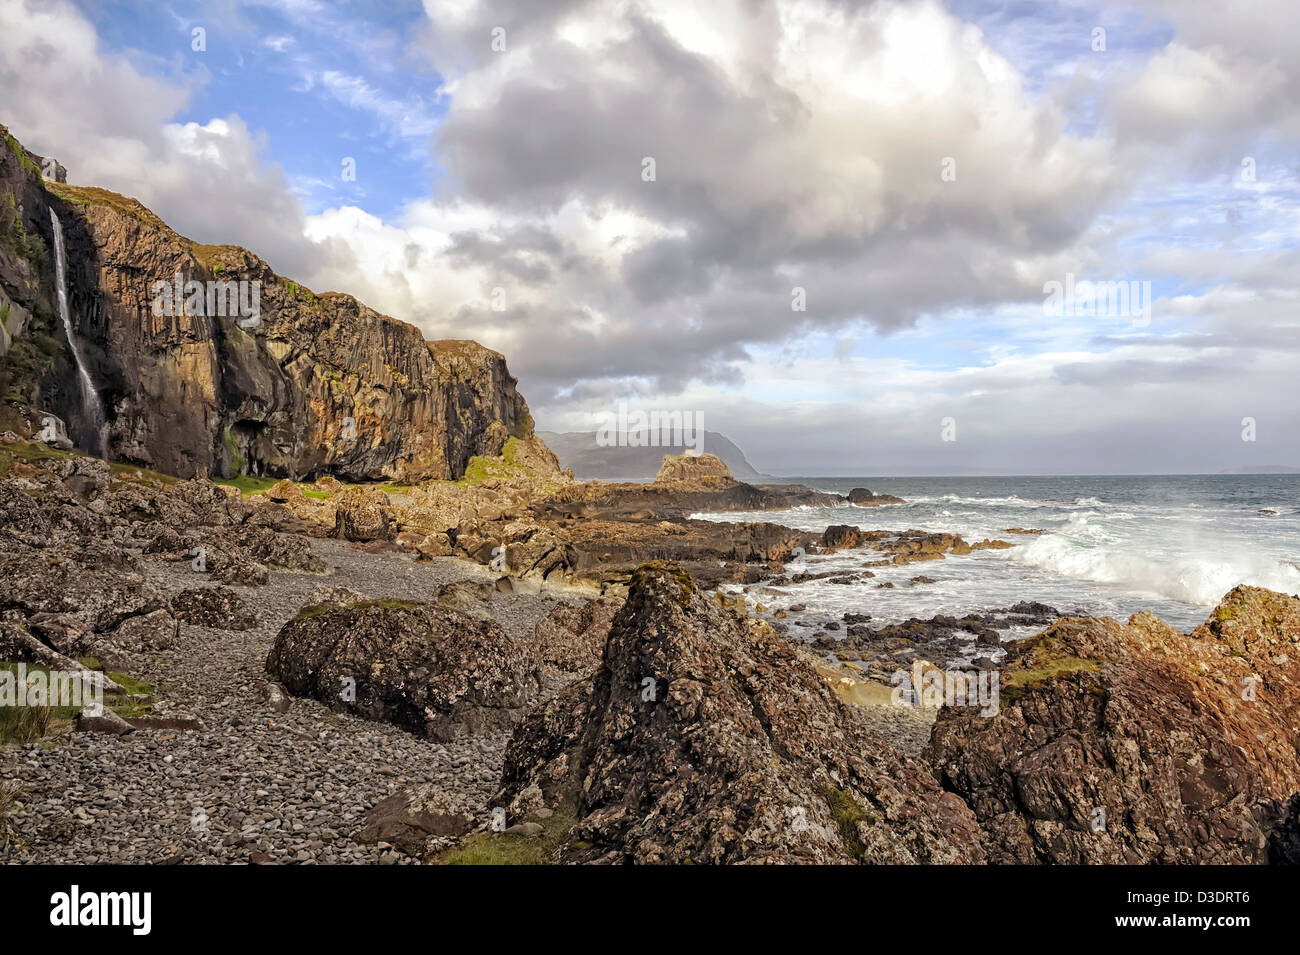 rugged basalt cliffs & stormy sky, mull, scotland - Stock Image